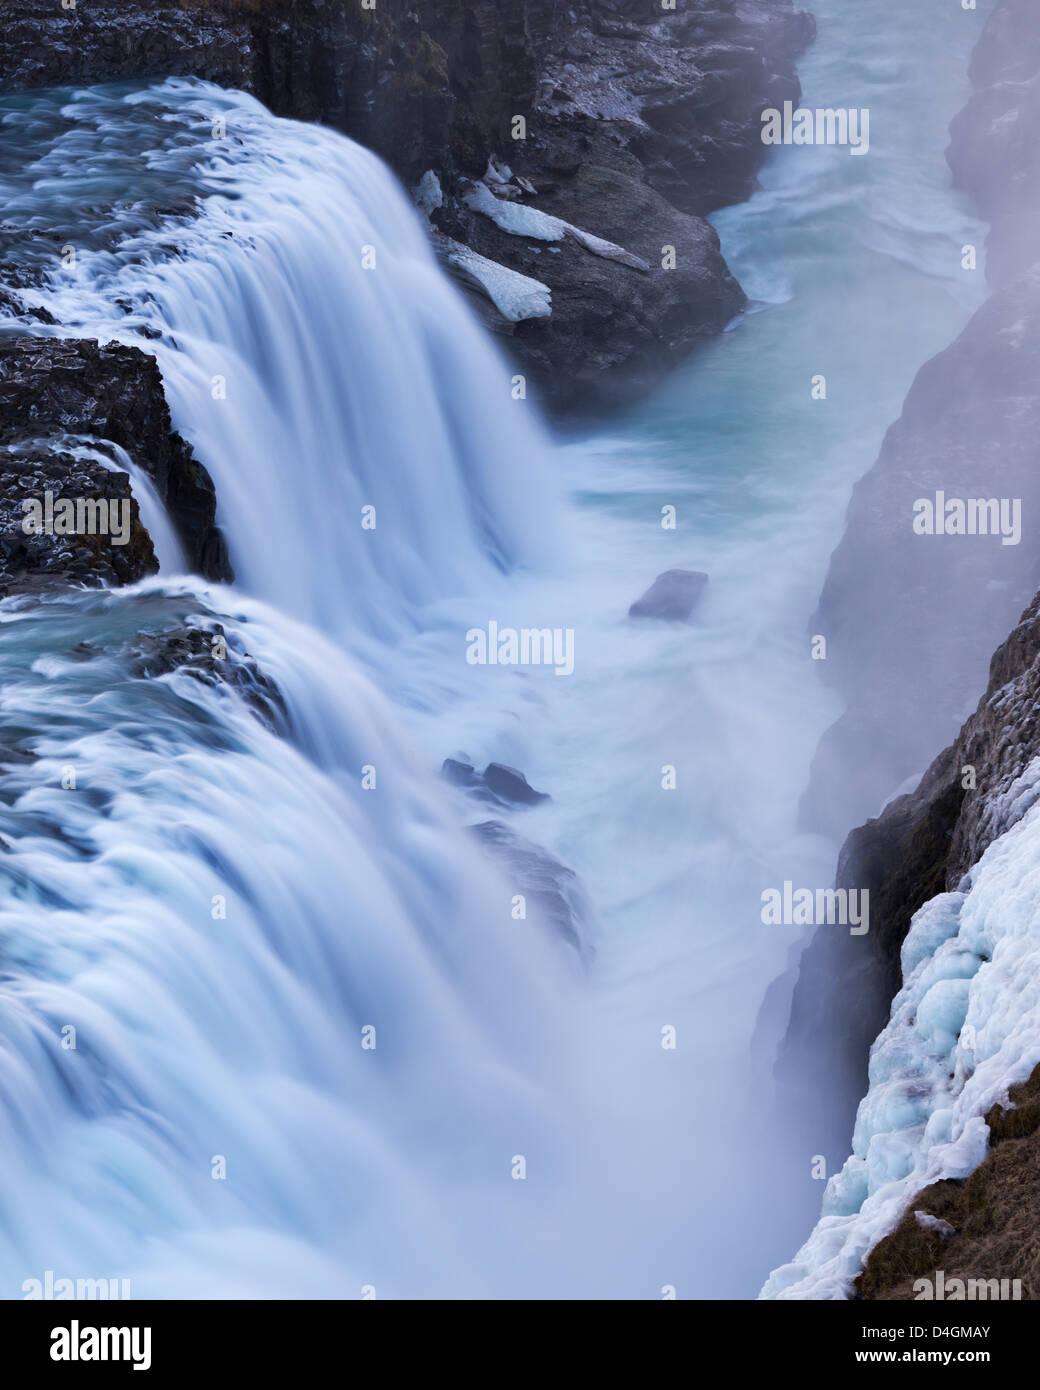 Am tosenden Gullfoss Wasserfall in Island. Winter (Januar) 2013. Stockbild